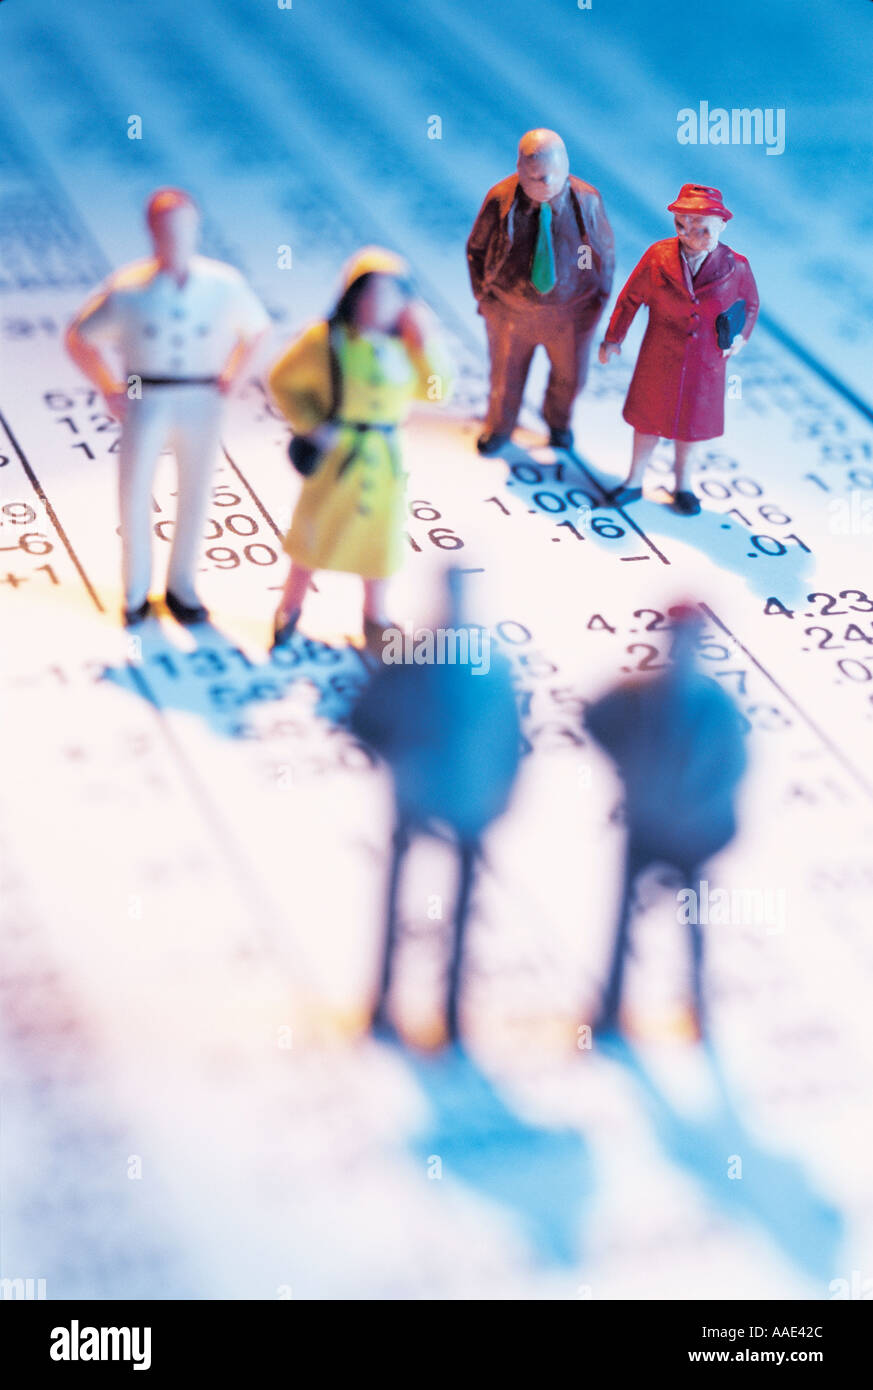 Minature Figures on Stock Listings - Stock Image